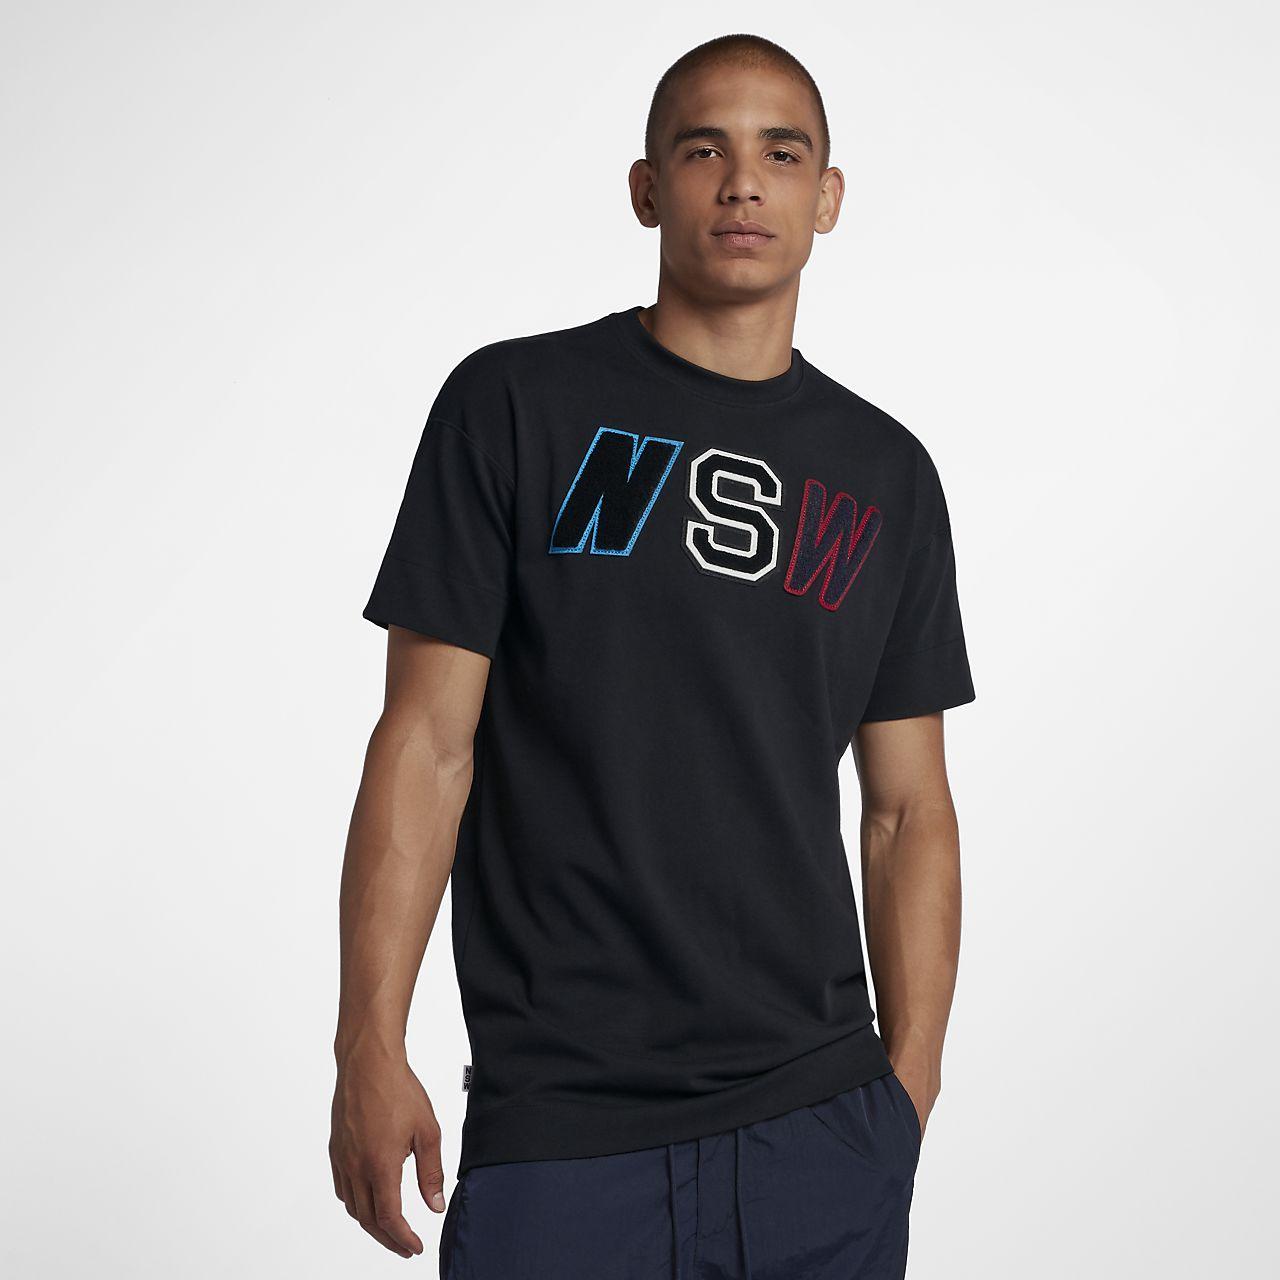 sports shoes 9a721 8f2b8 ... Tee-shirt Nike Sportswear NSW pour Homme